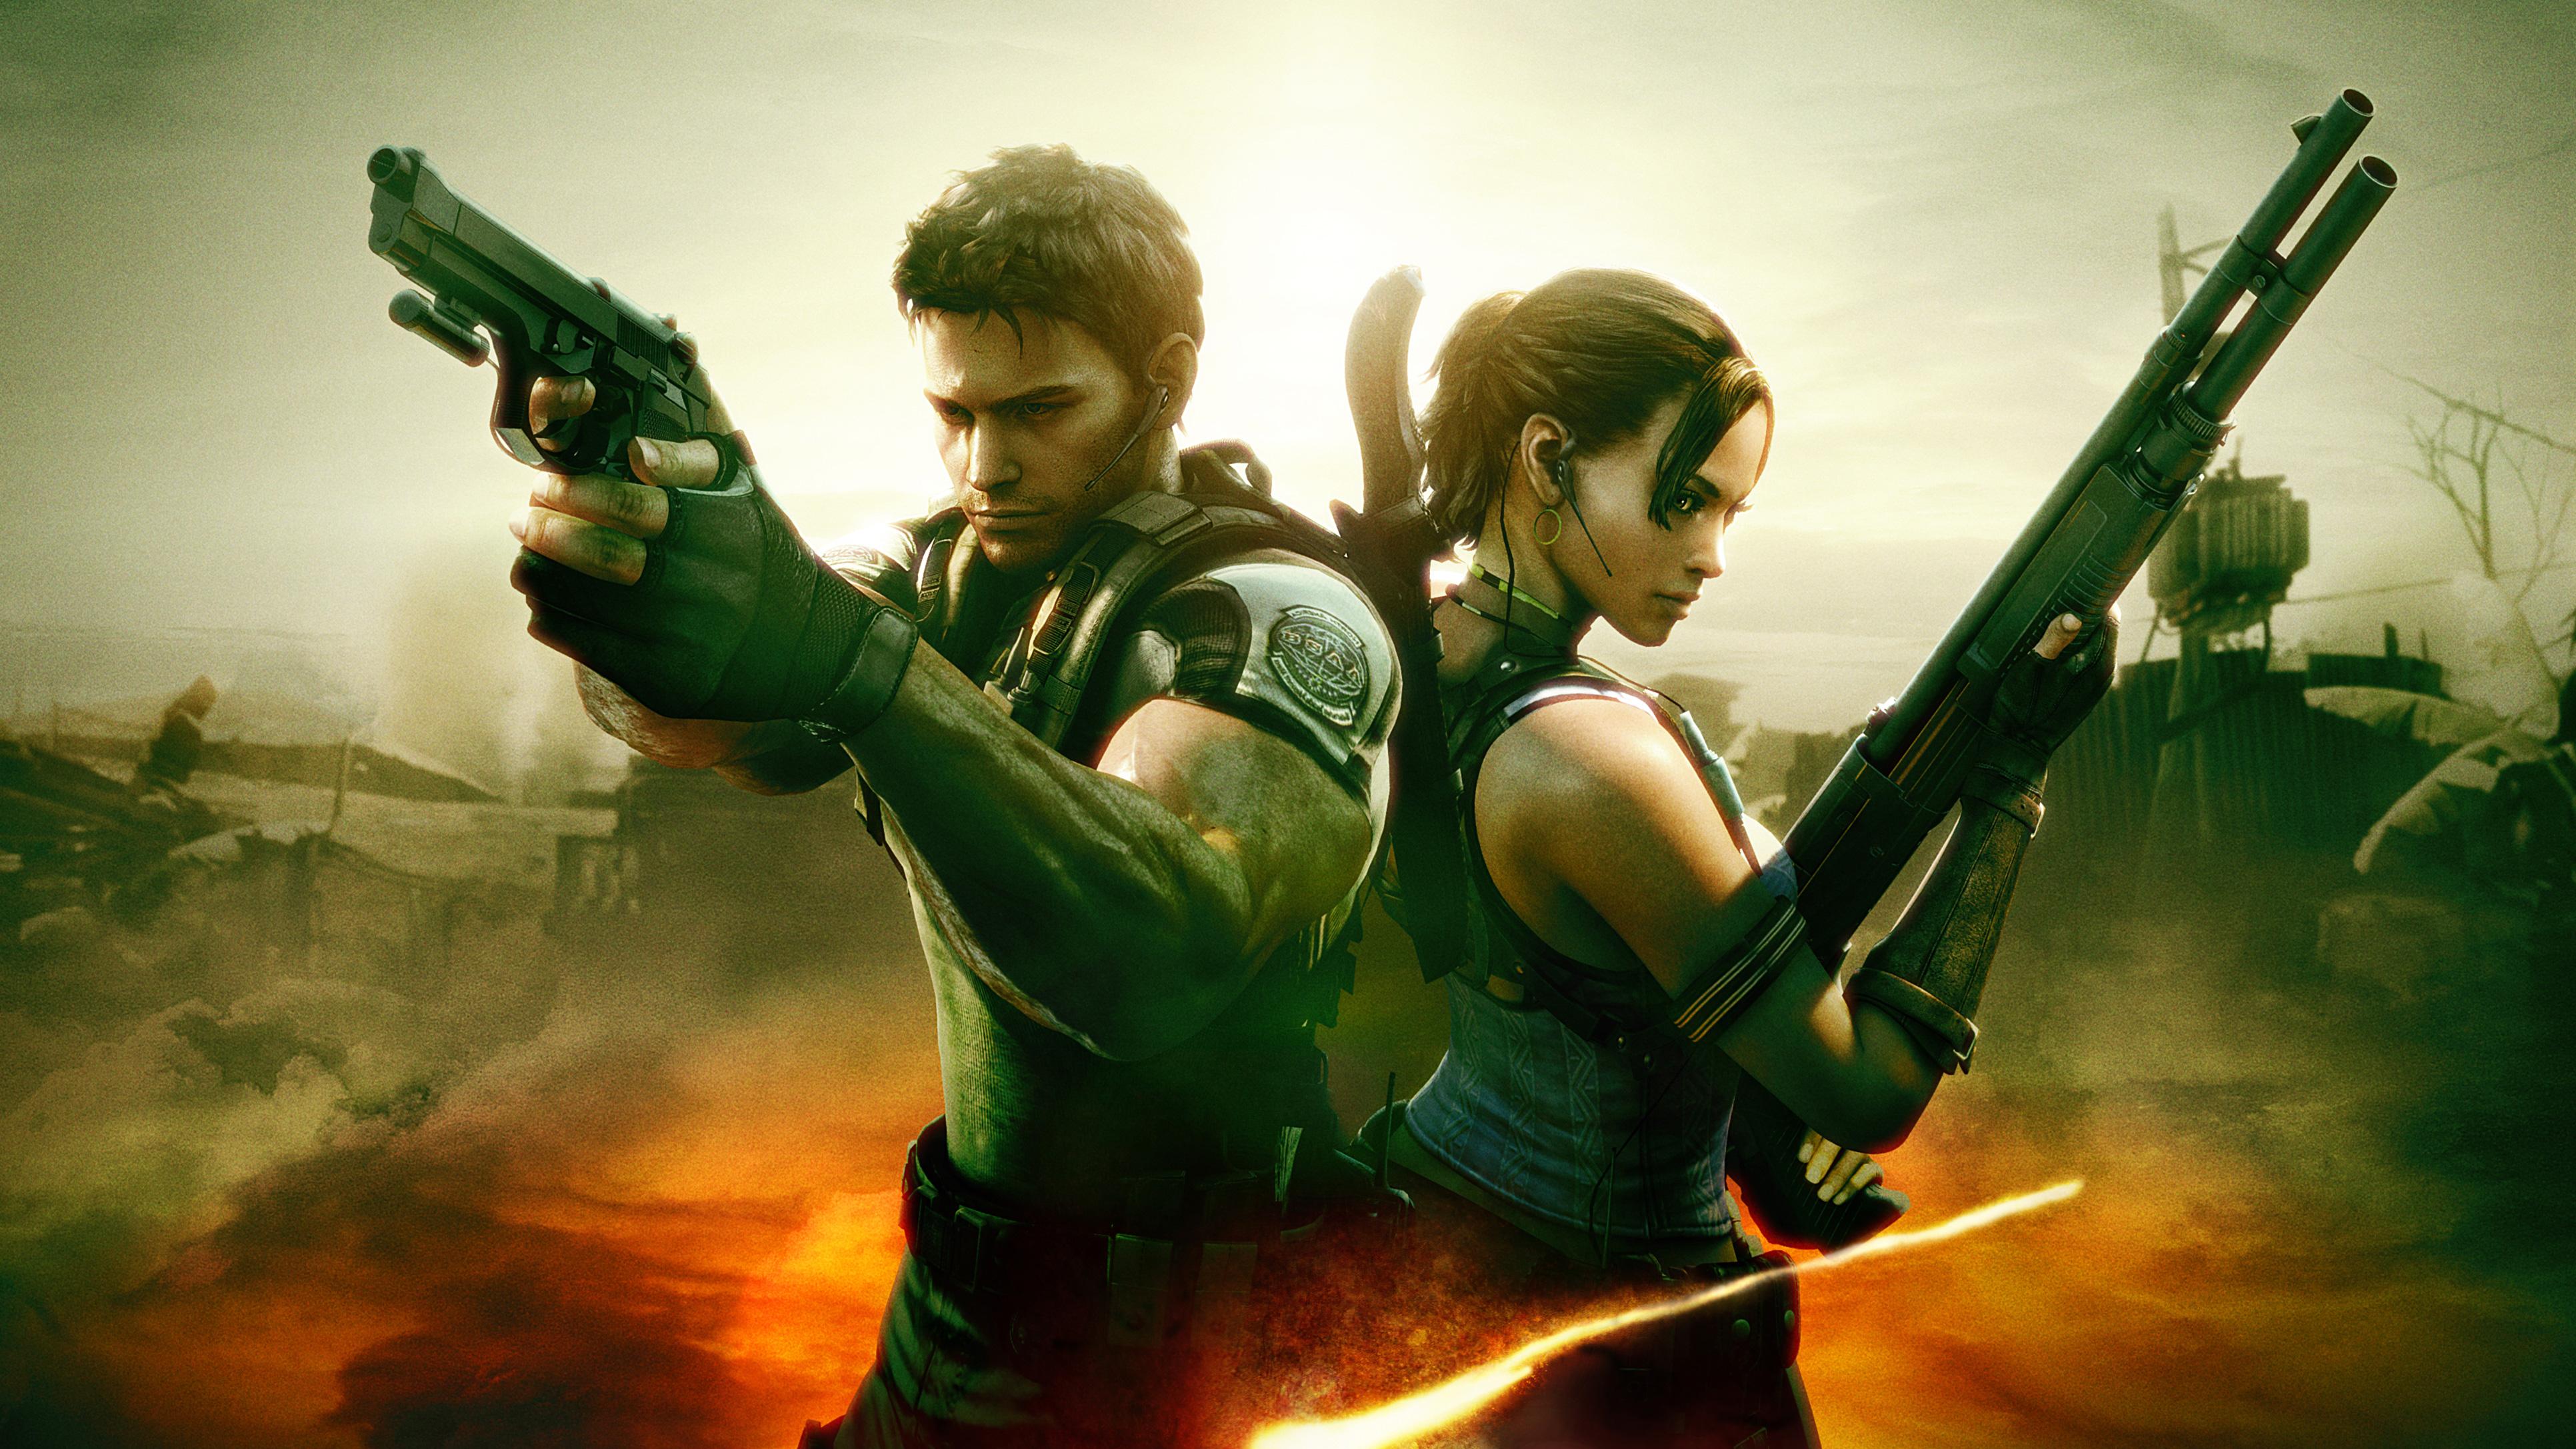 Resident Evil 5 4k Hd Games 4k Wallpapers Images Backgrounds